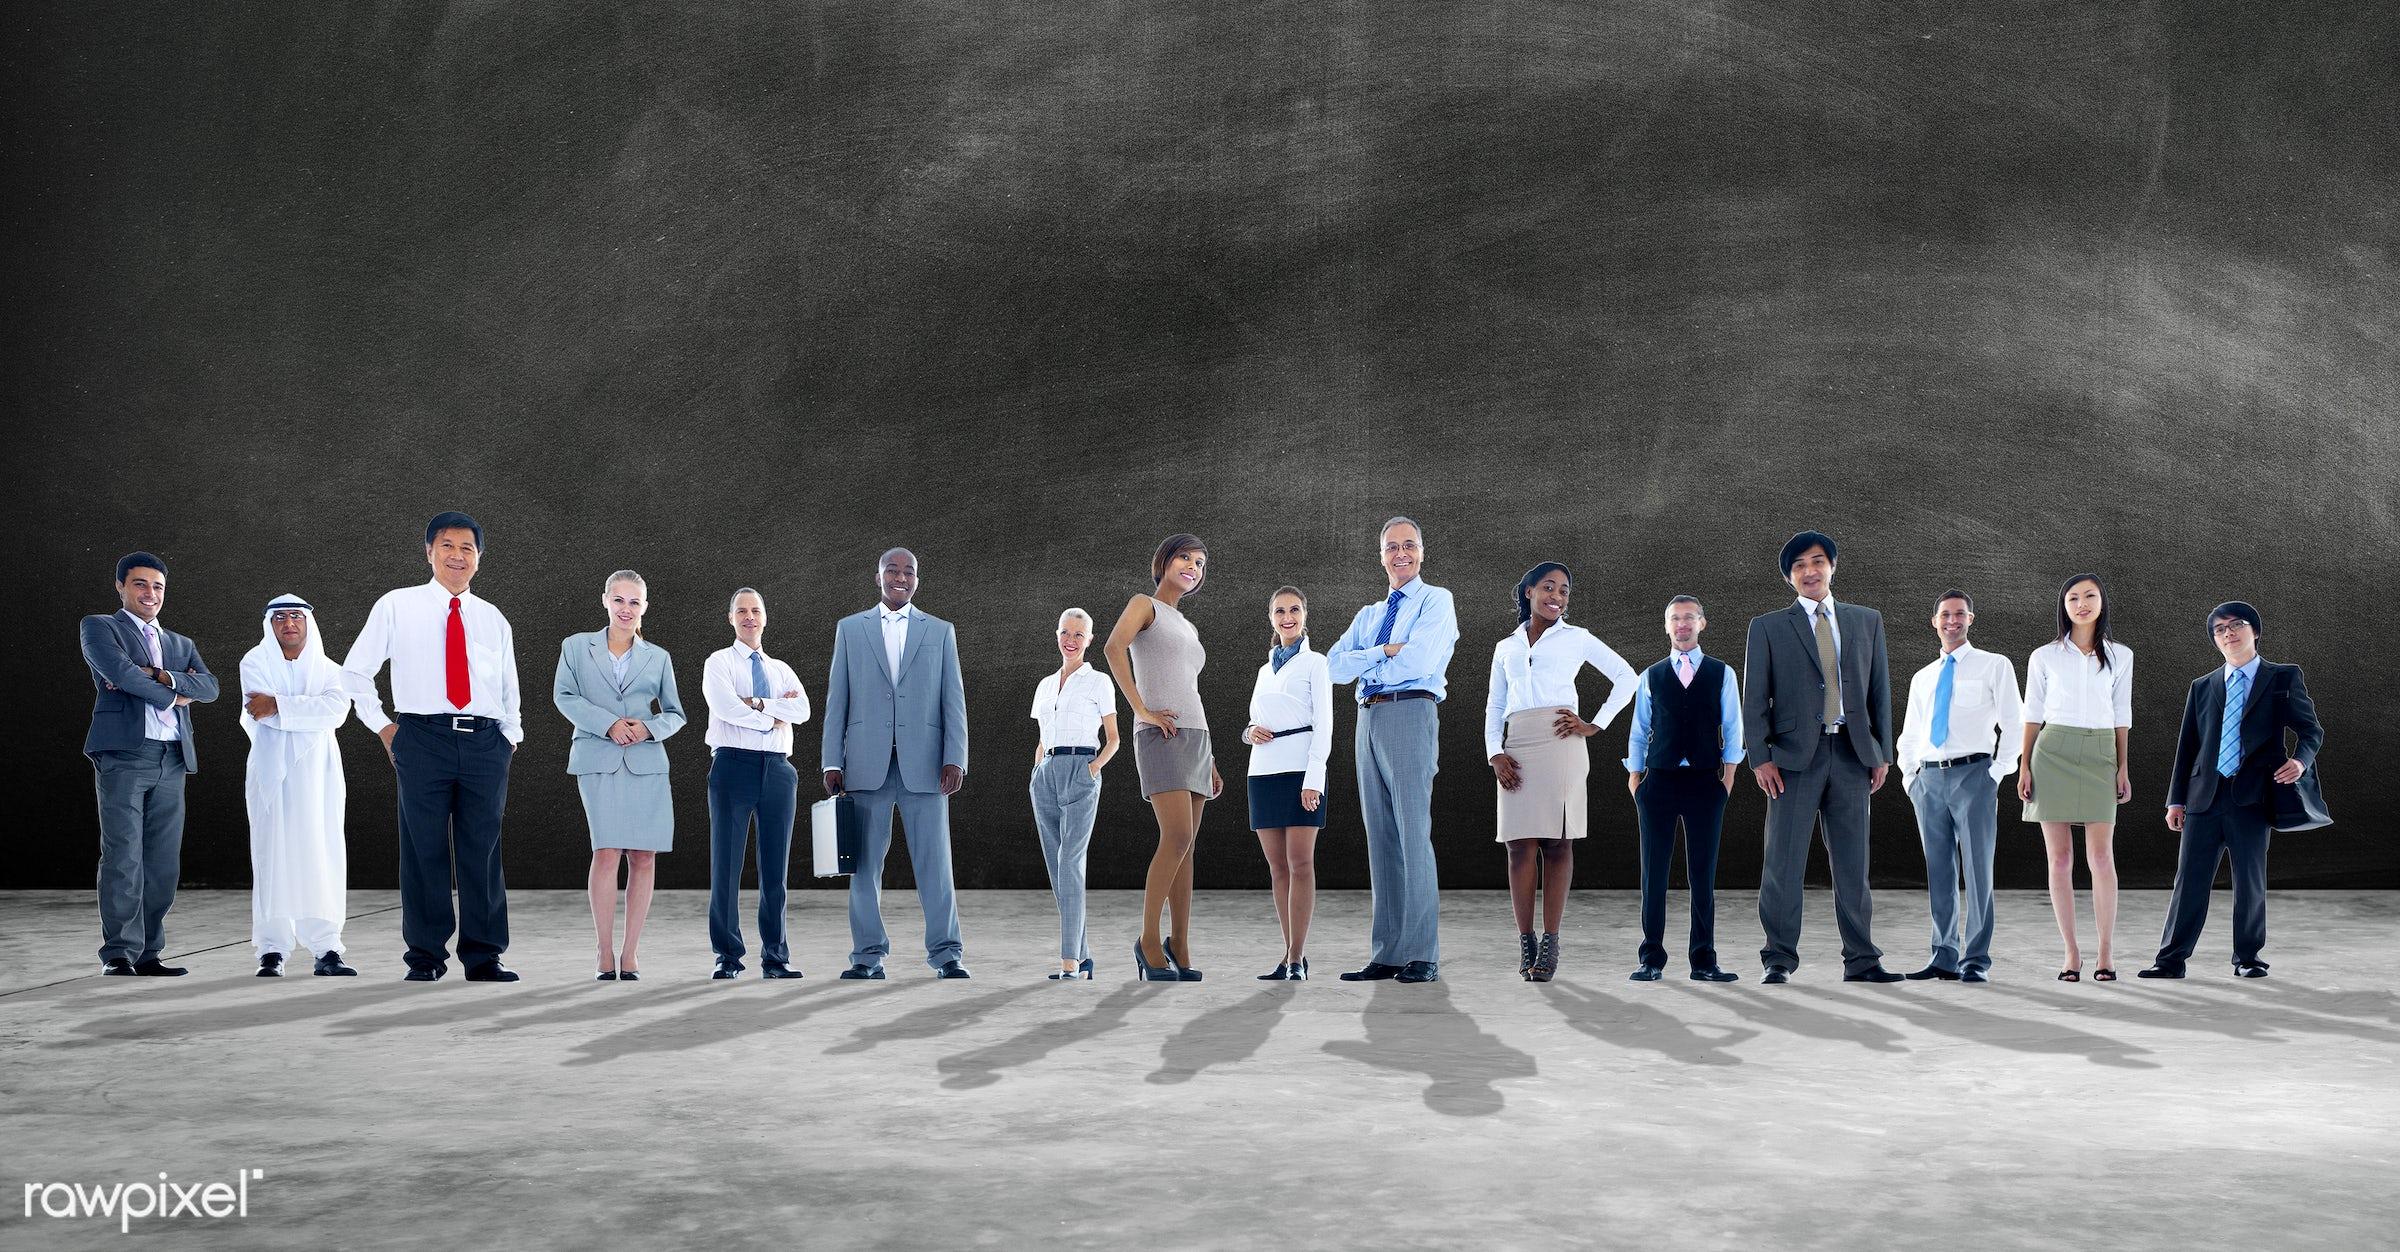 blackboard, business, business people, businessmen, businesswomen, cement, chalkboard, concrete, concrete floor, corporate,...